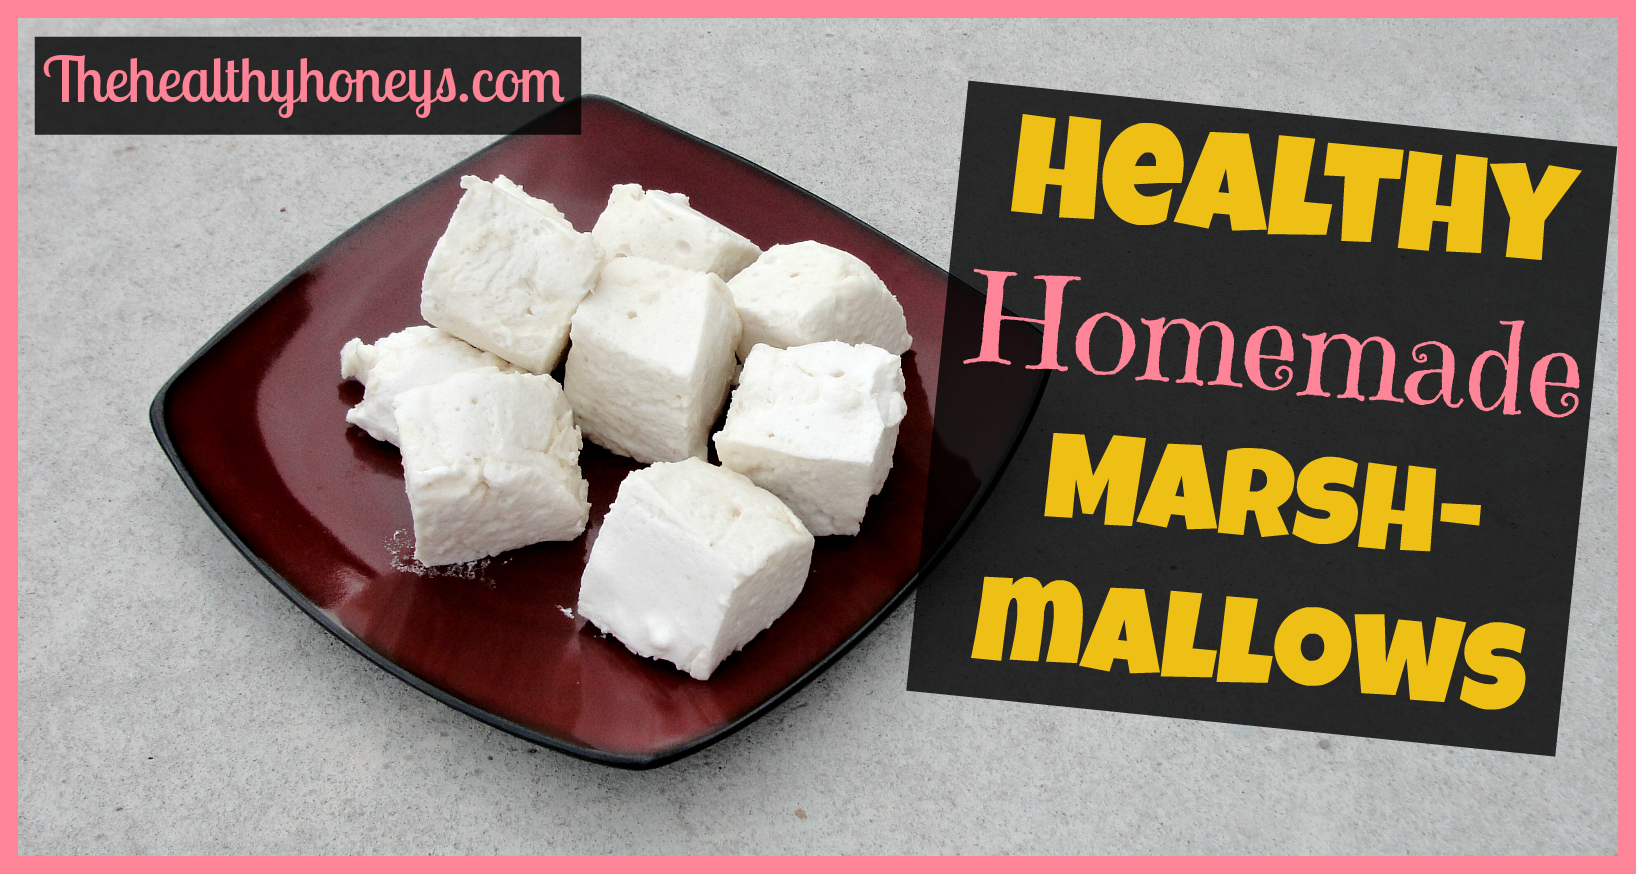 Healthy Homemade Christmas Gifts: Healthy Homemade Marshmallows